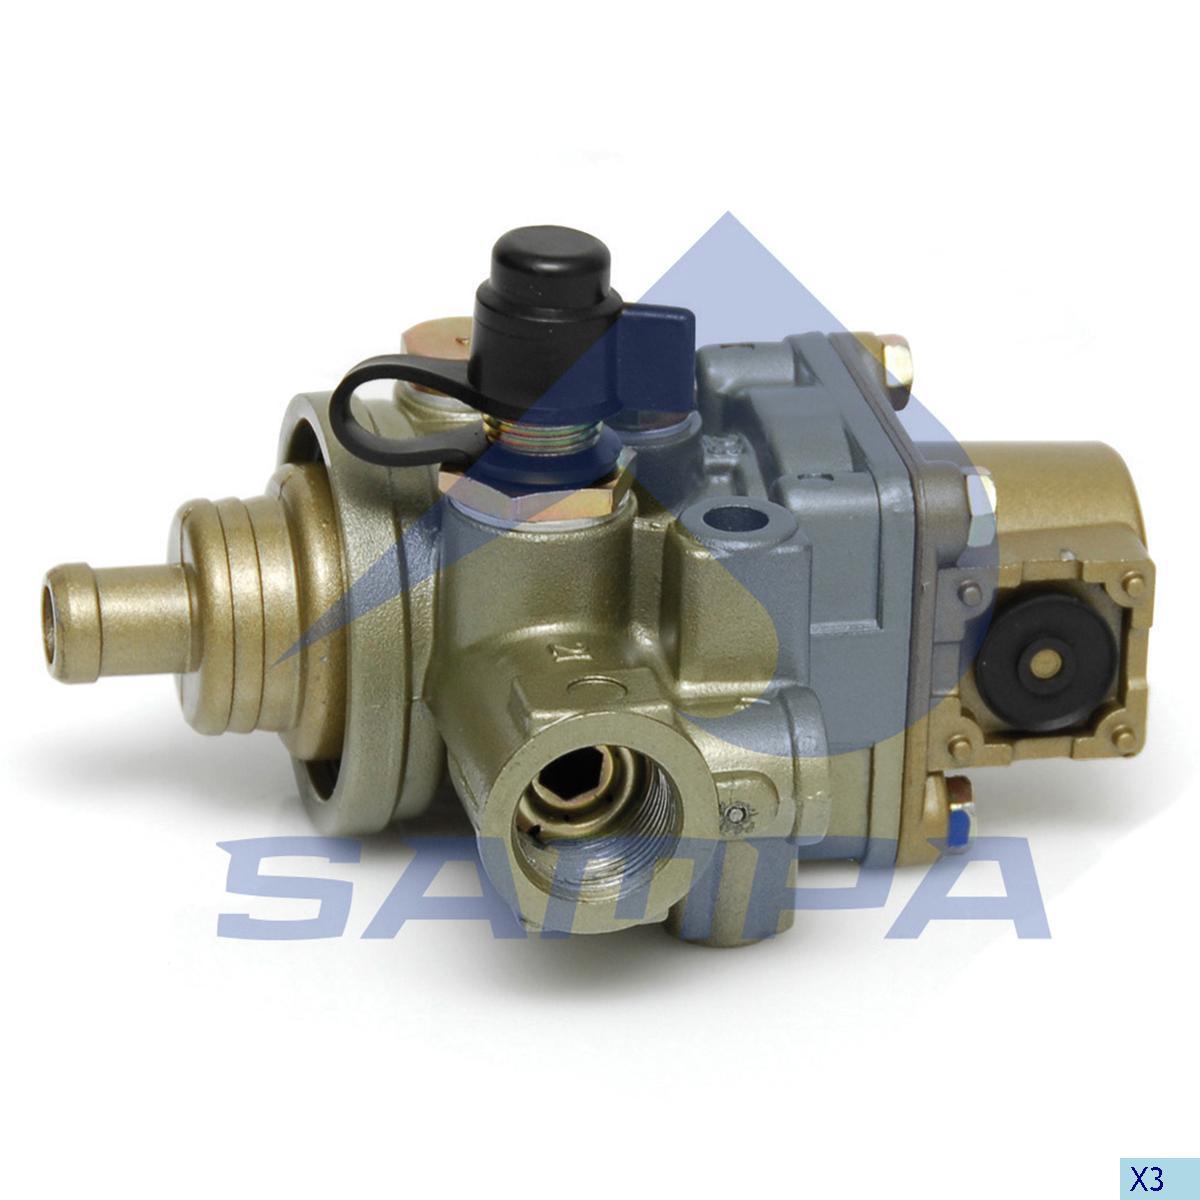 Pressure Control Valve, R.V.I., Compressed Air System